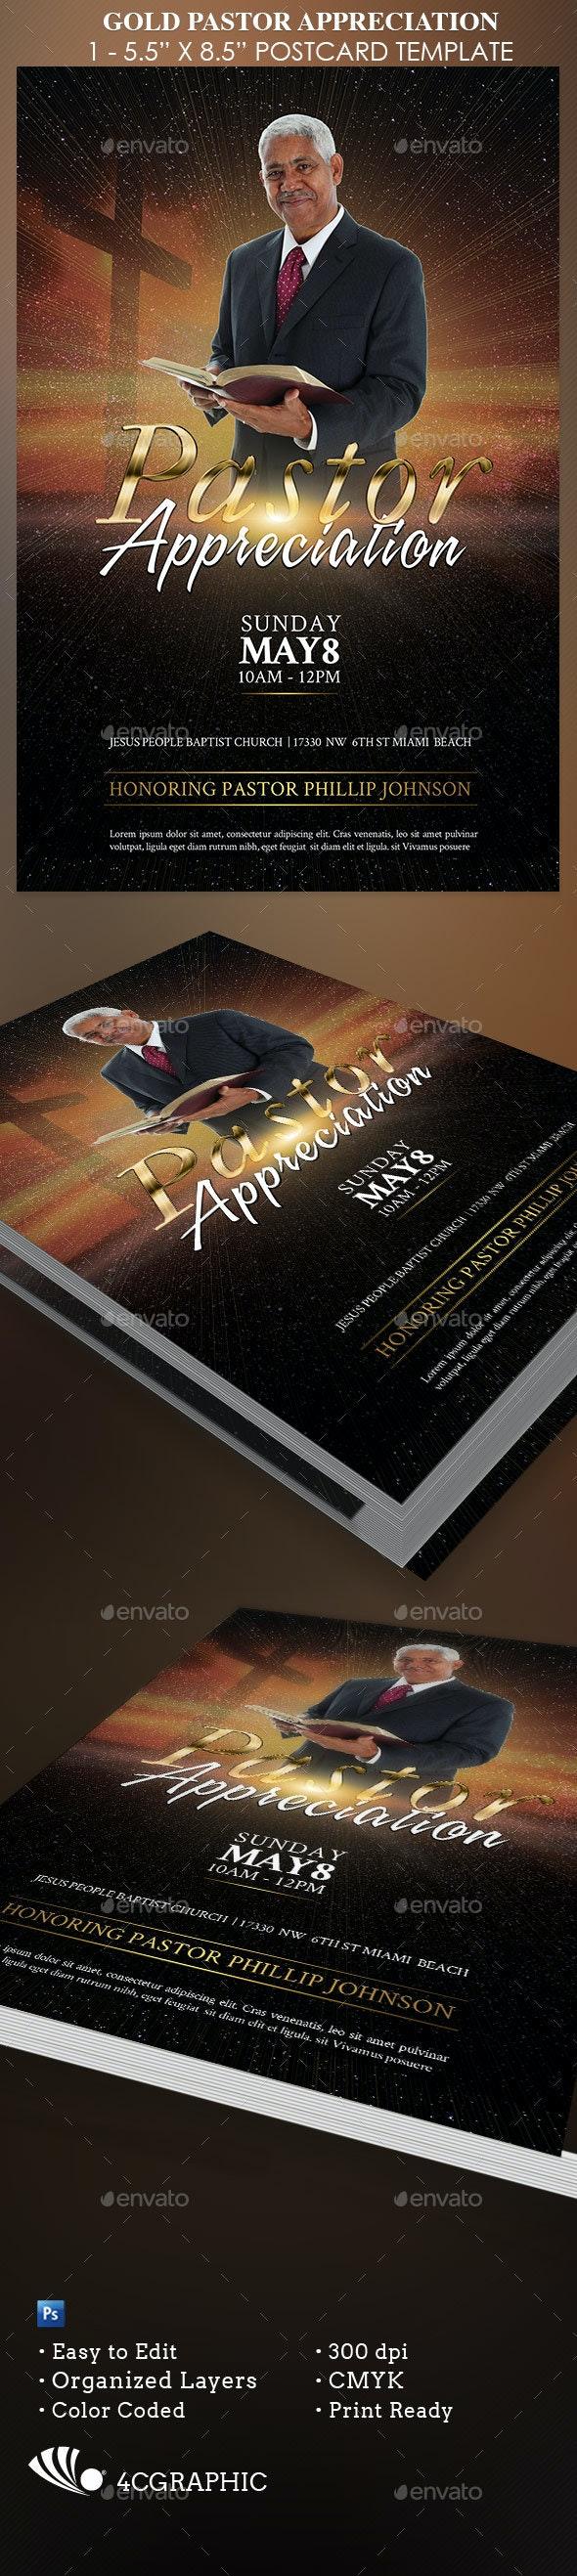 Gold Pastor Appreciation - Church Flyers